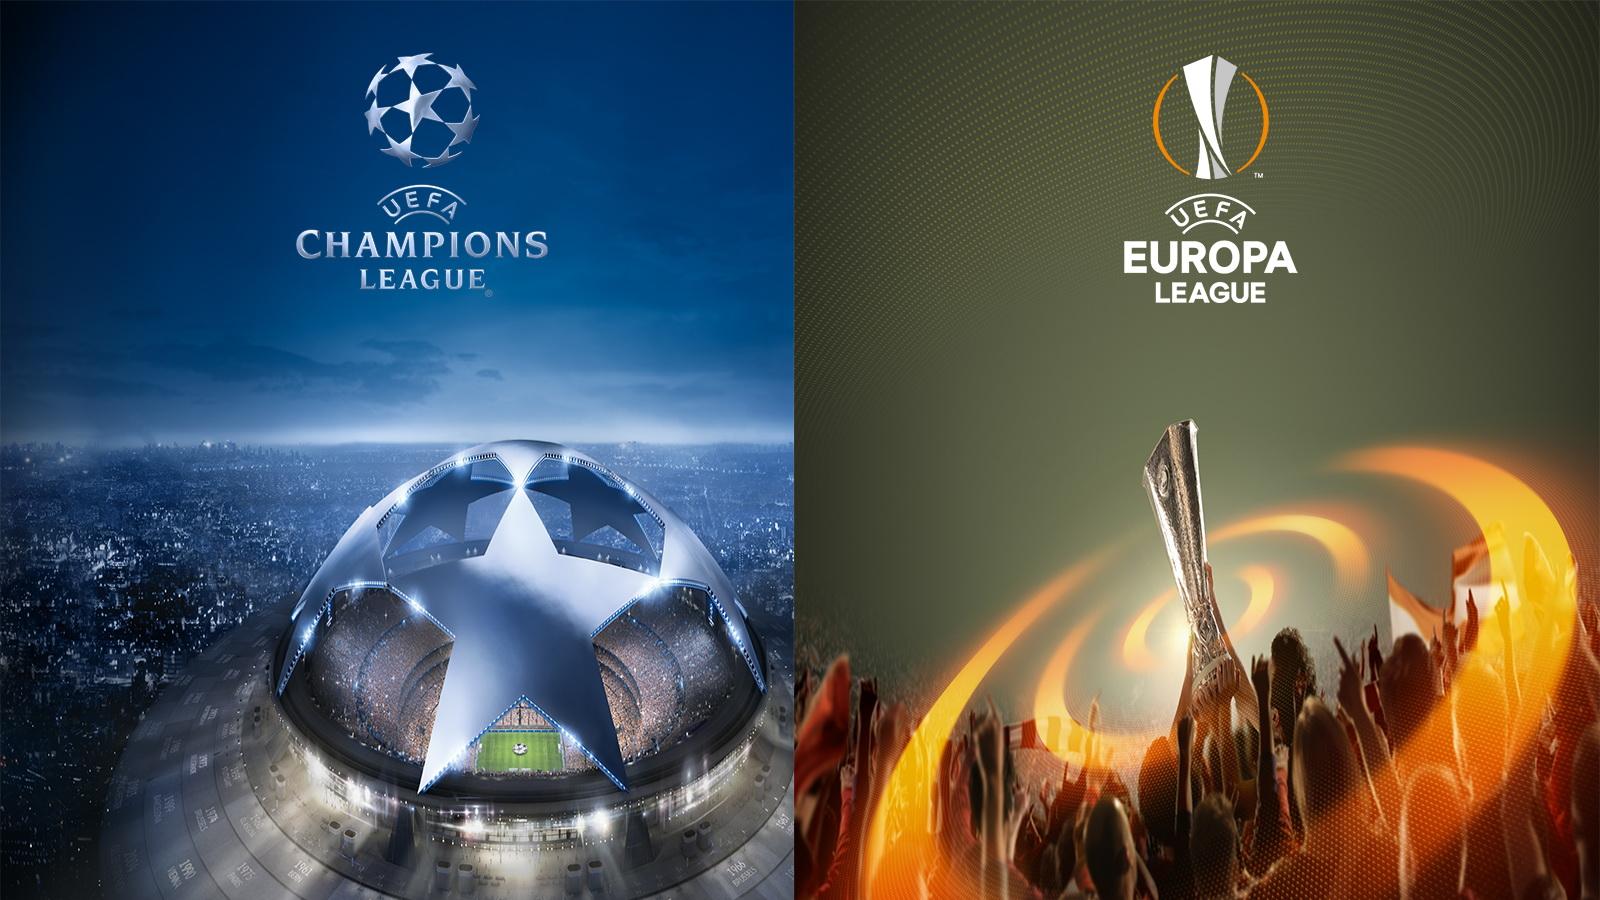 UEFA: PES-MODIF: PES 2013 UCL And UEL 2016 Graphic V3 By A. Deniz